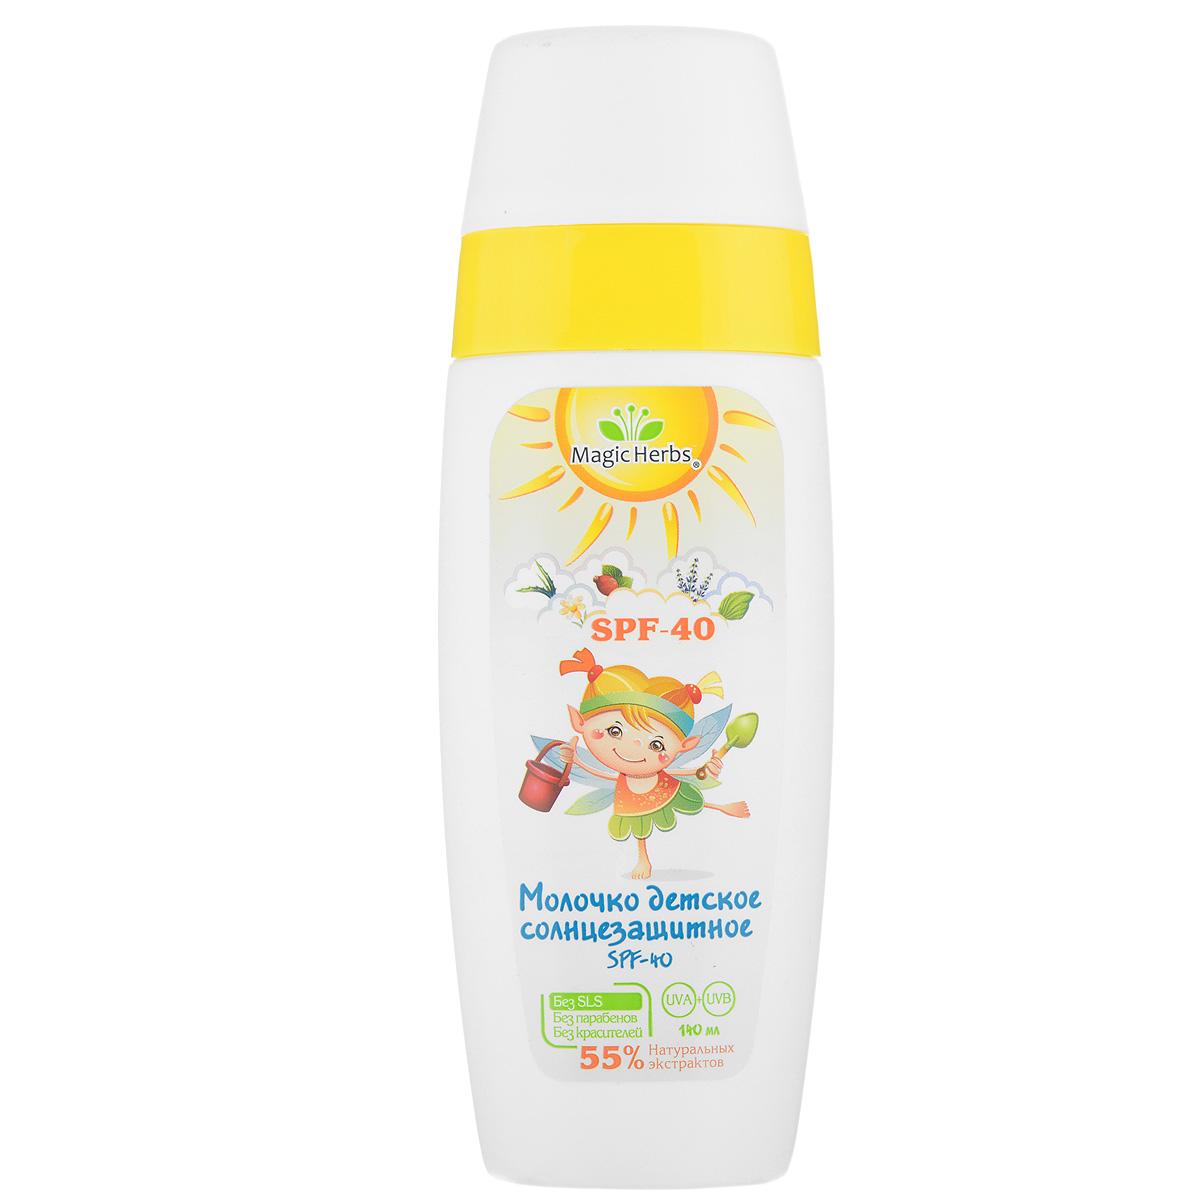 Magic Herbs Молочко детское солнцезащитное, SPF-40, 140 мл